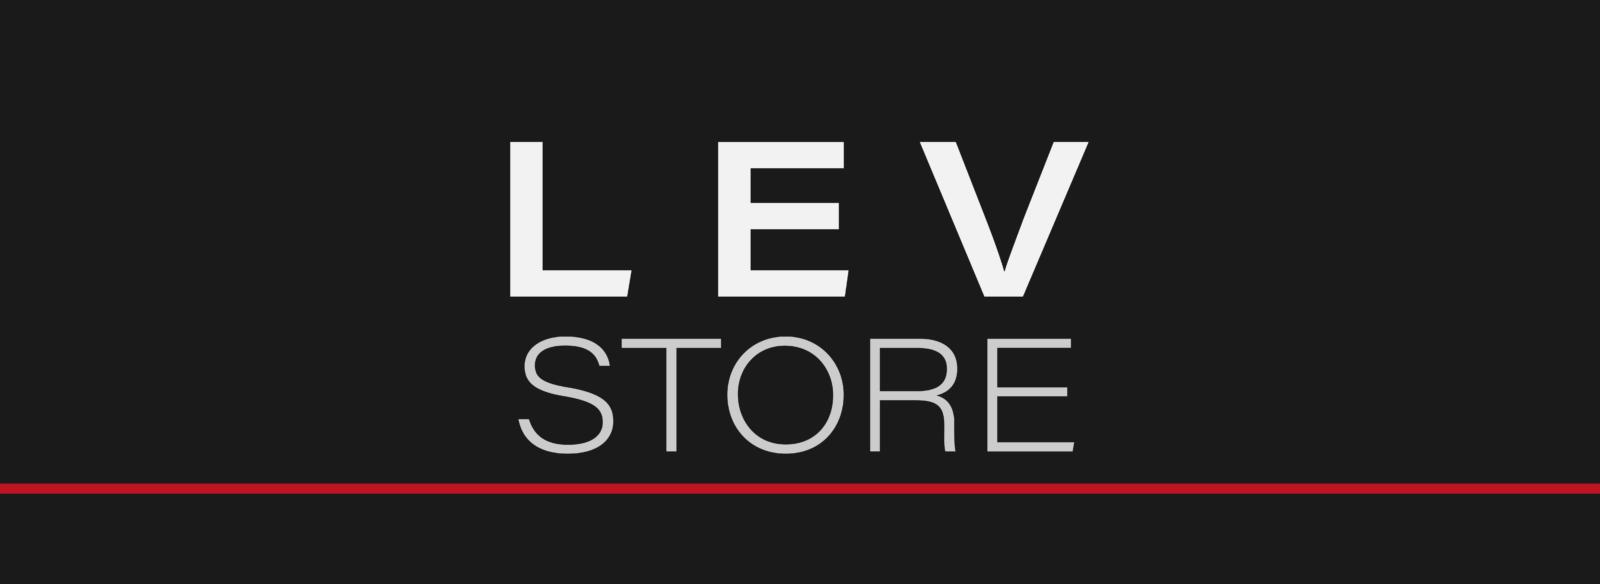 LevStore - Exklusive Möbel